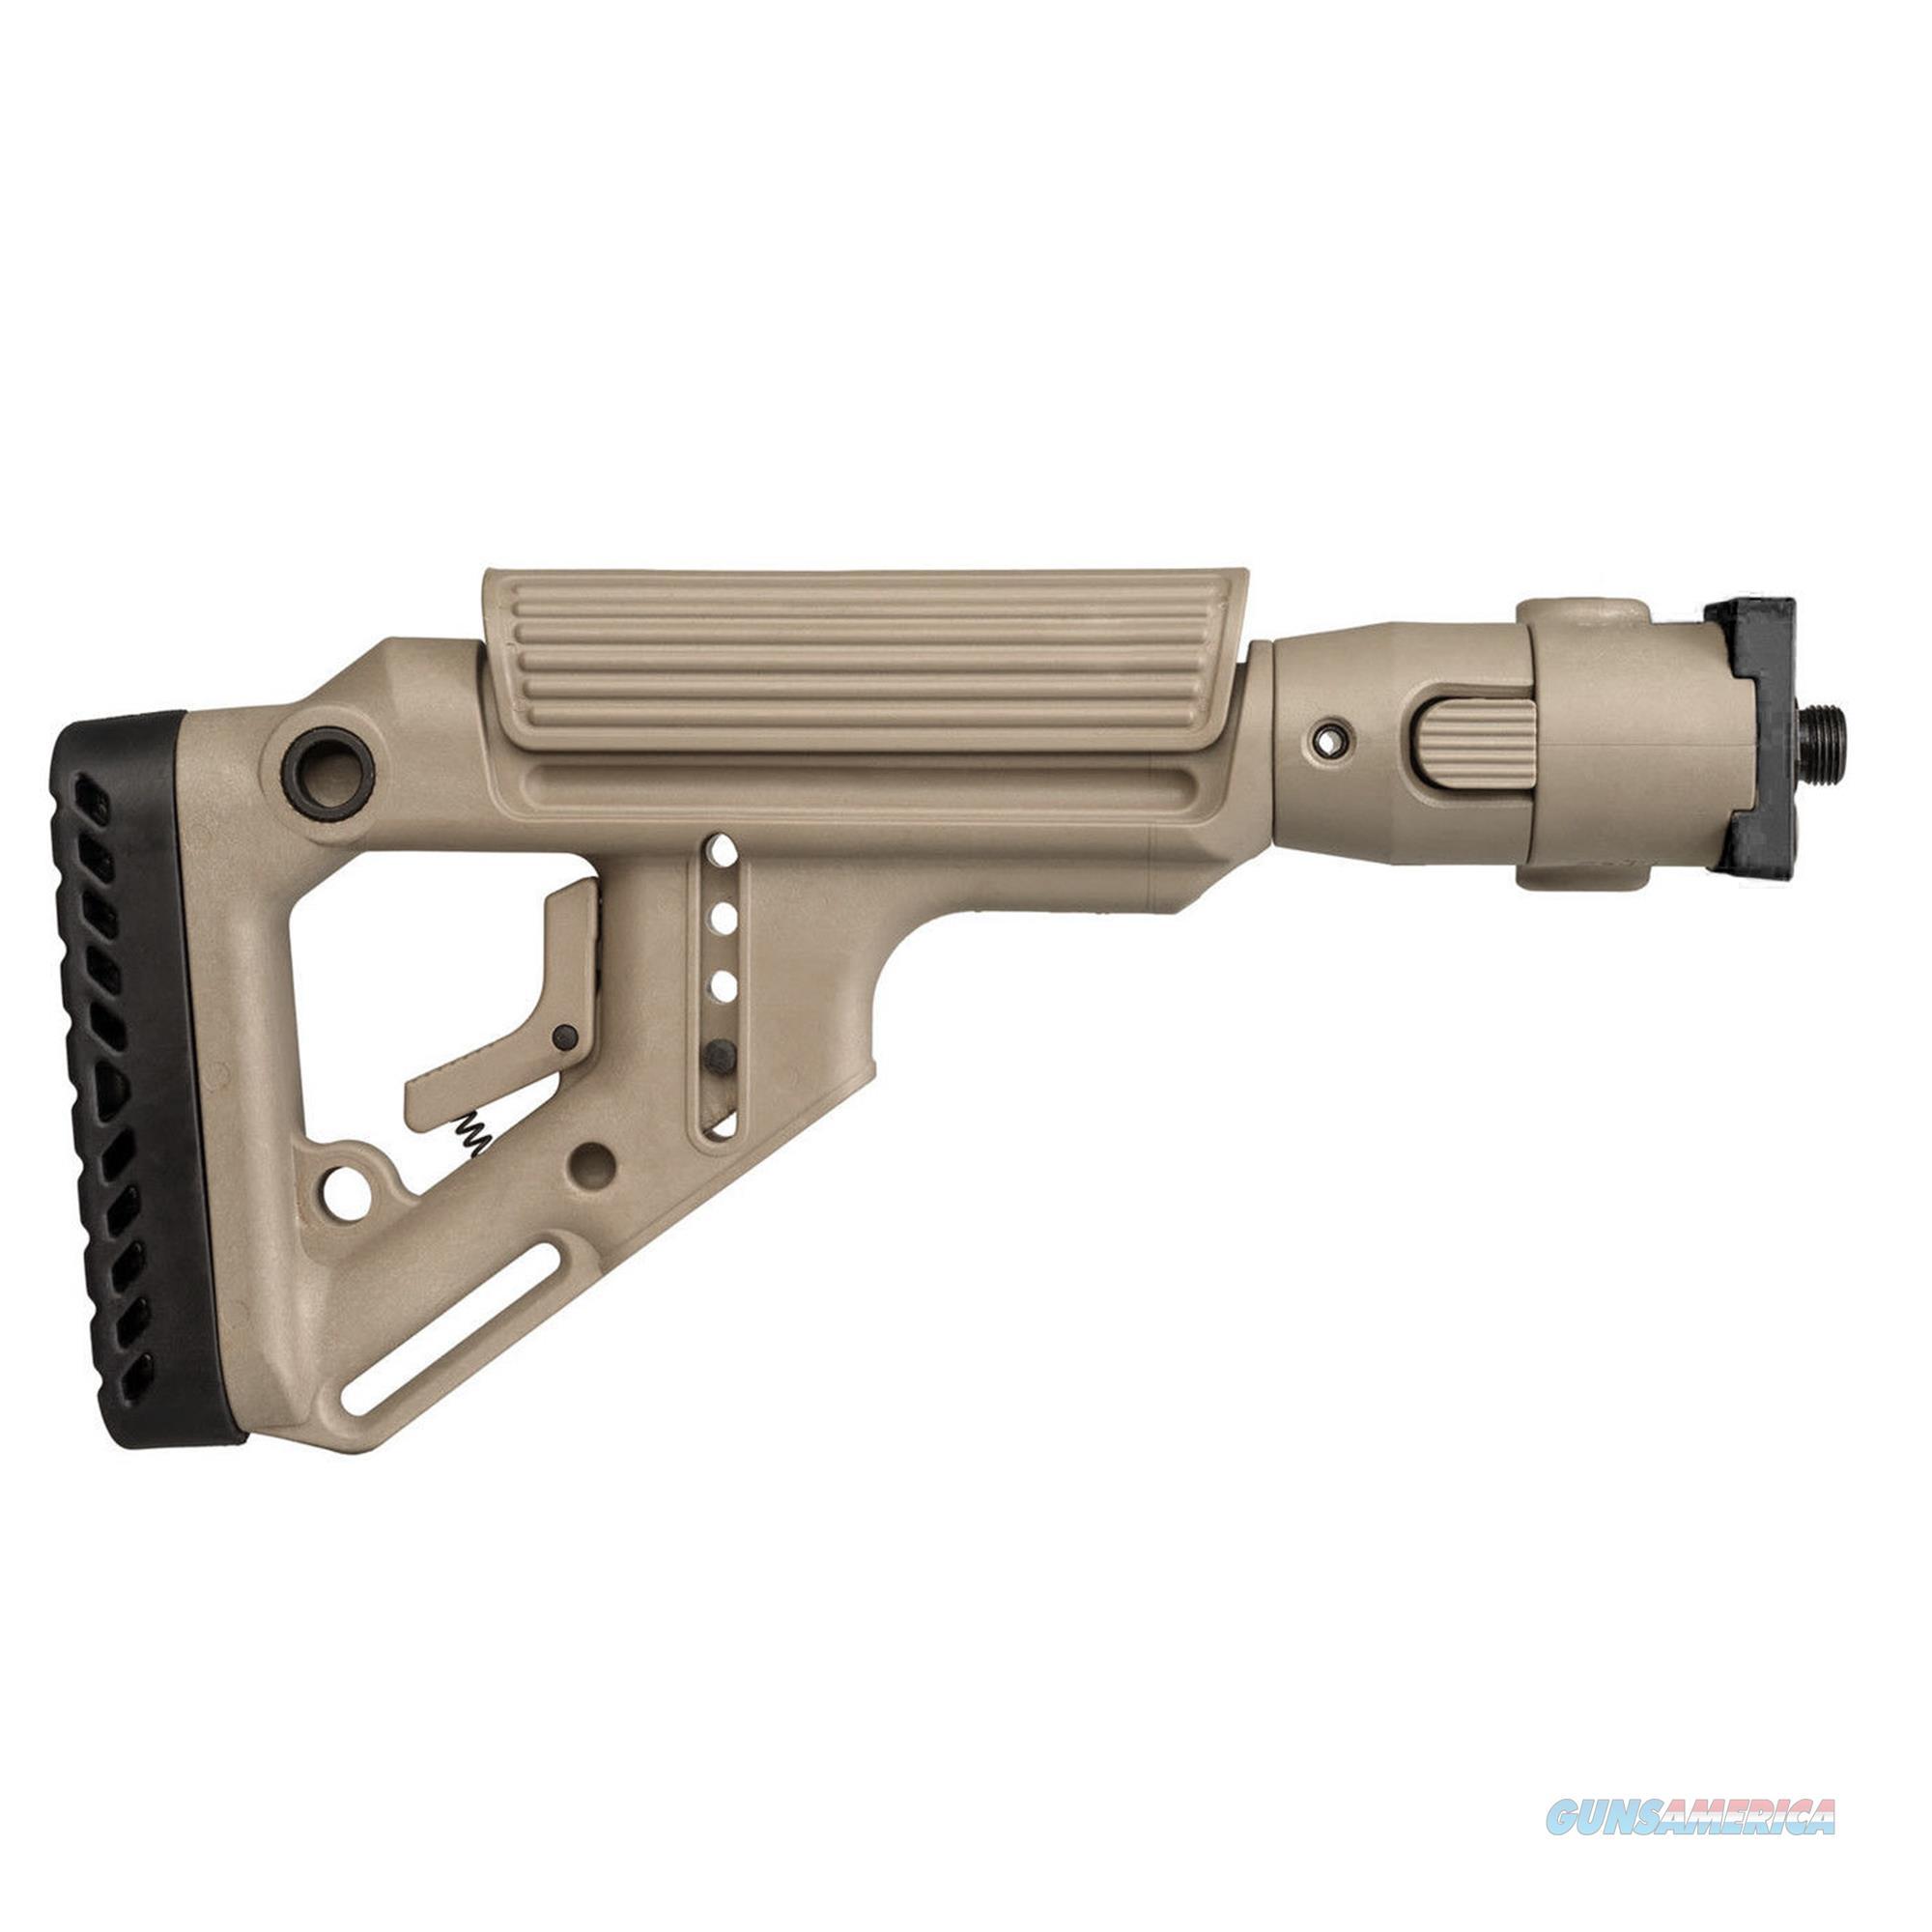 Mako Group Tactical Folding Buttstock UAS-VZP-FDE  Non-Guns > Gunstocks, Grips & Wood